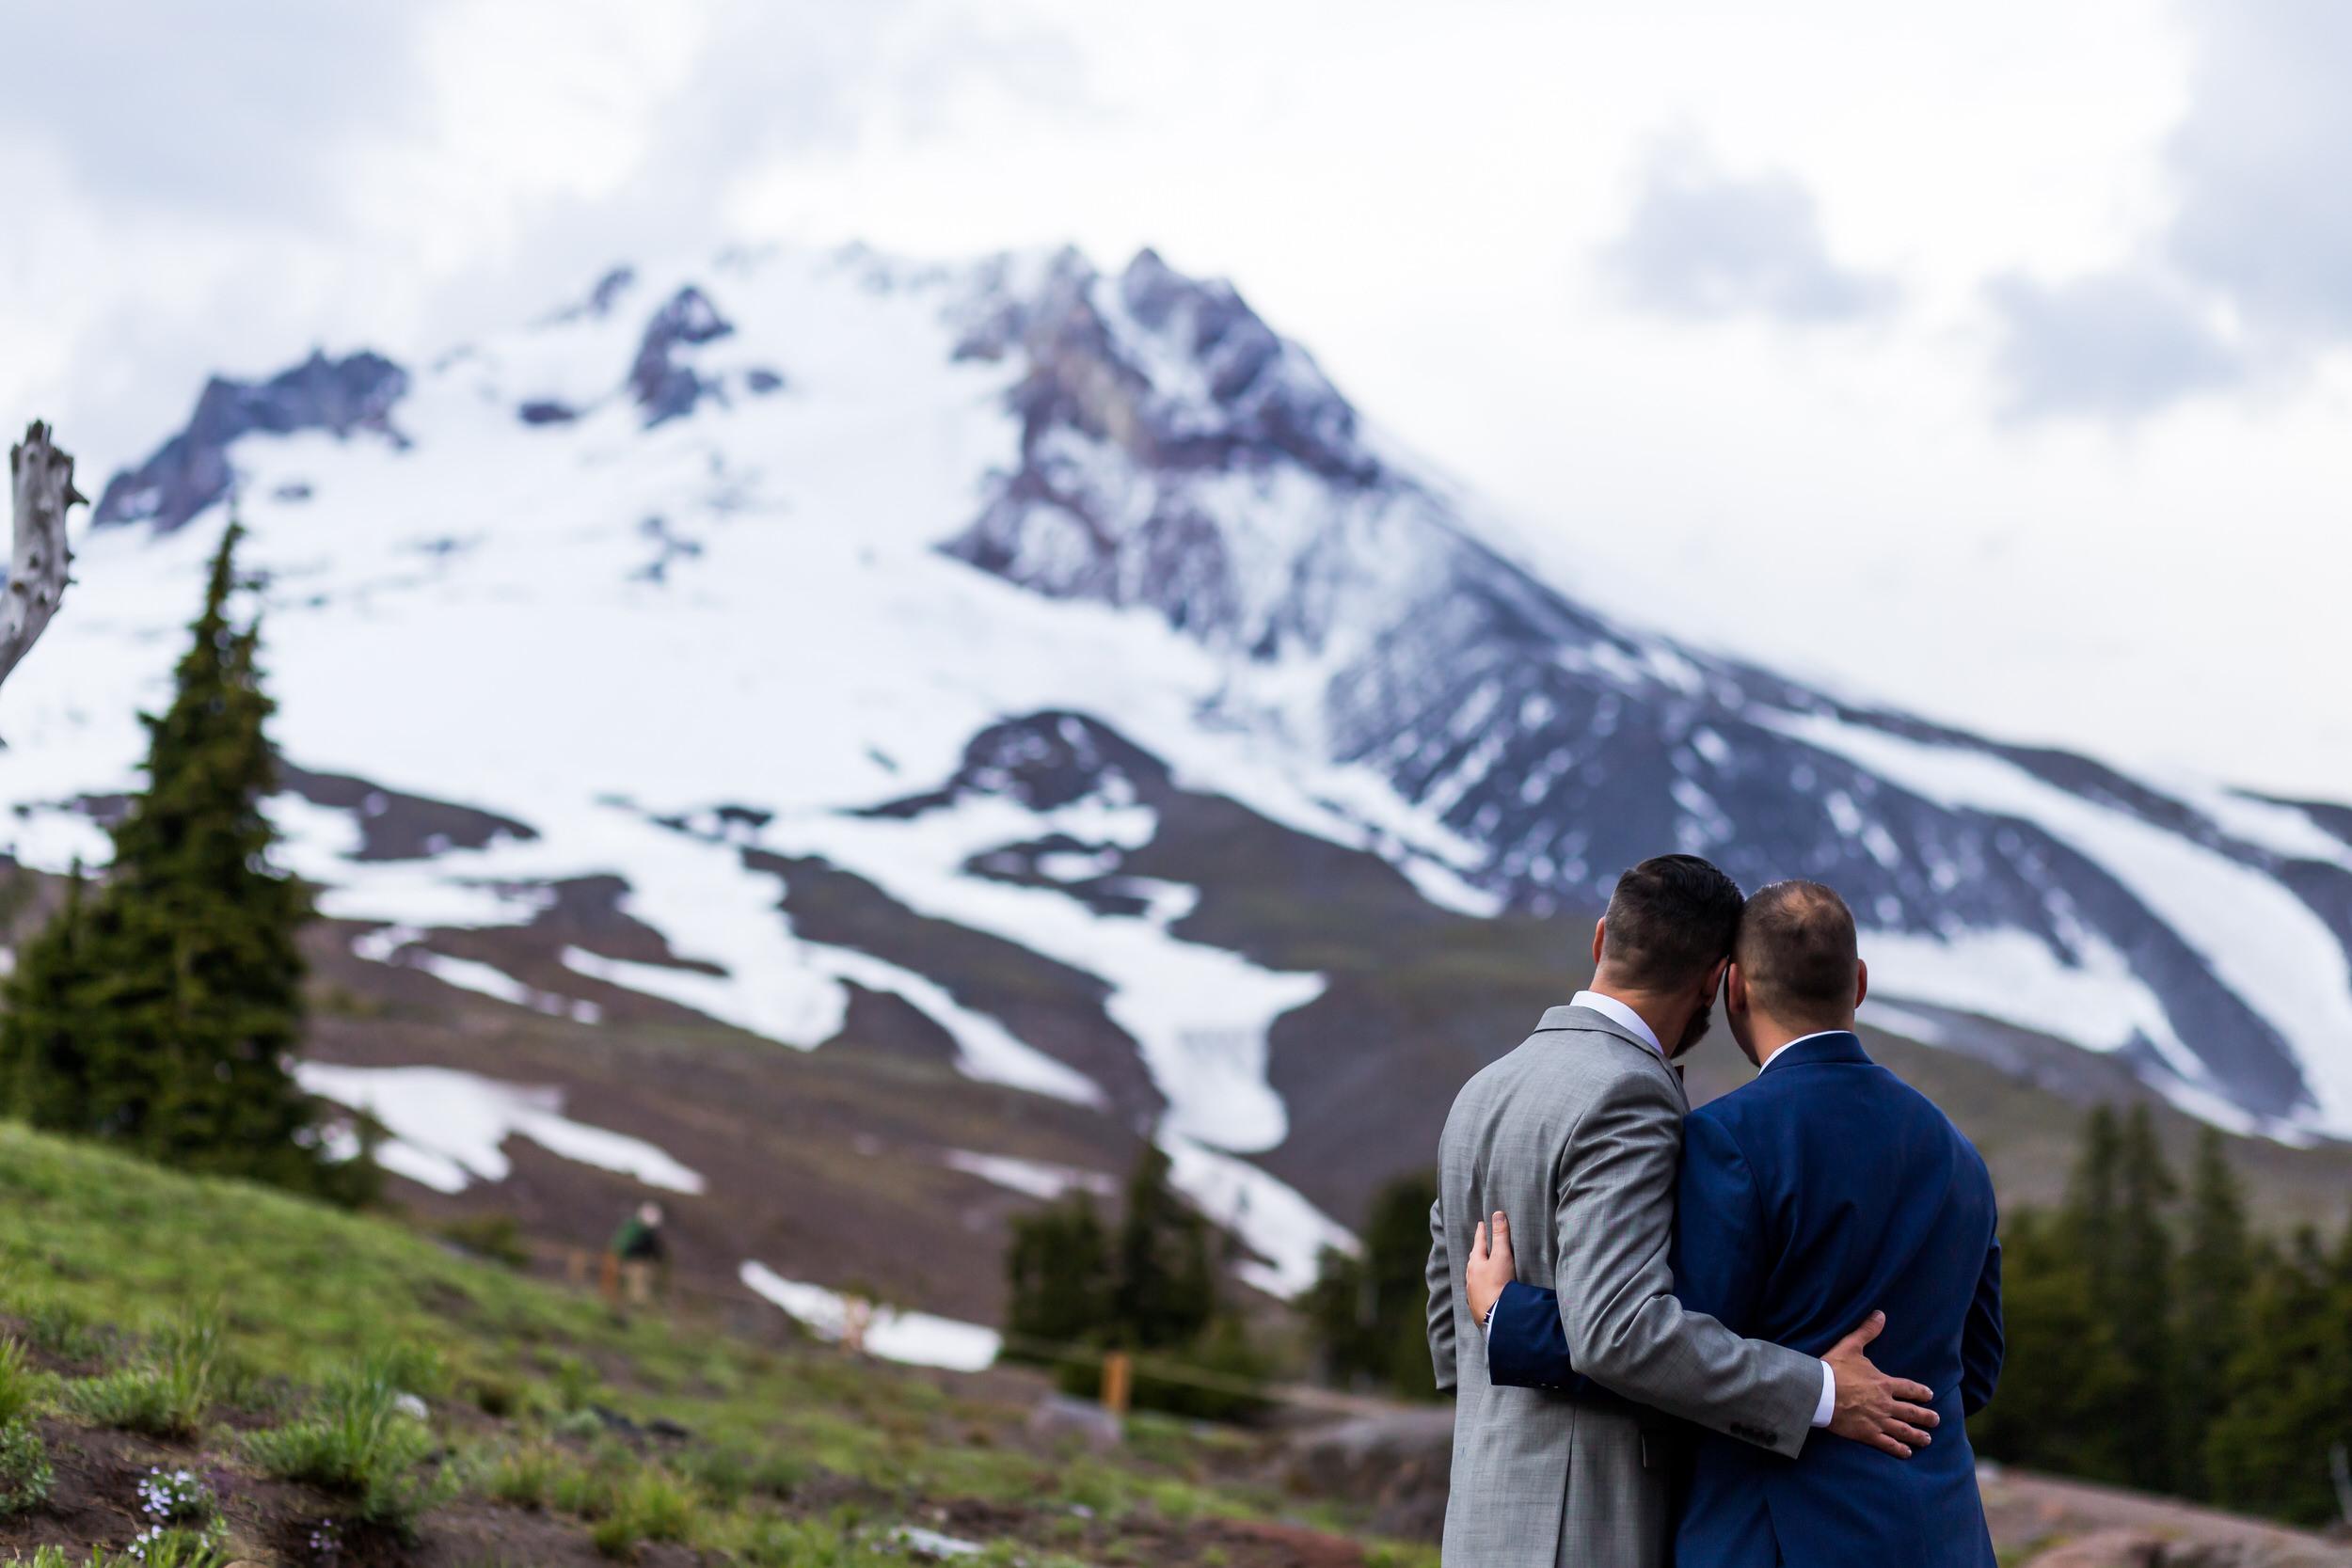 timberline_lodge_wedding_JCwedding_004